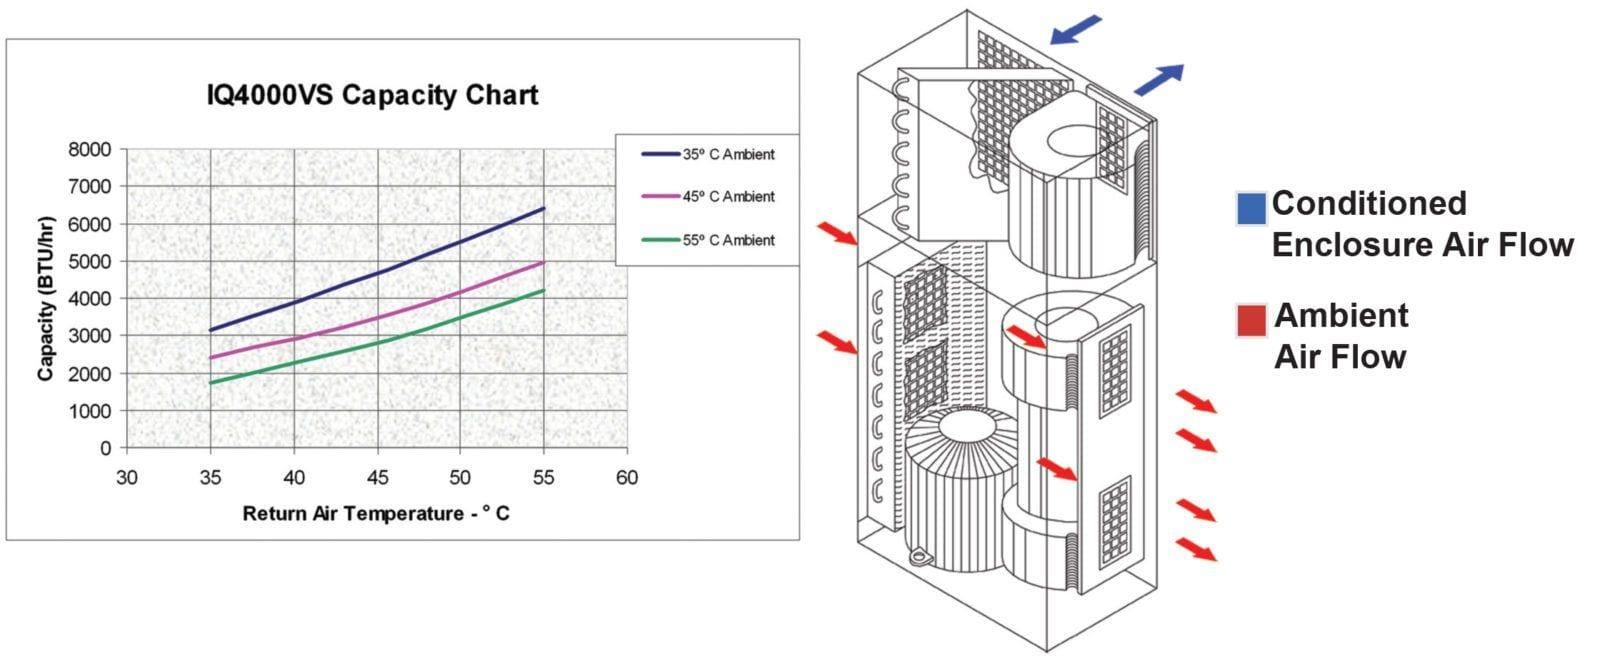 IQ4000VS-Capacity